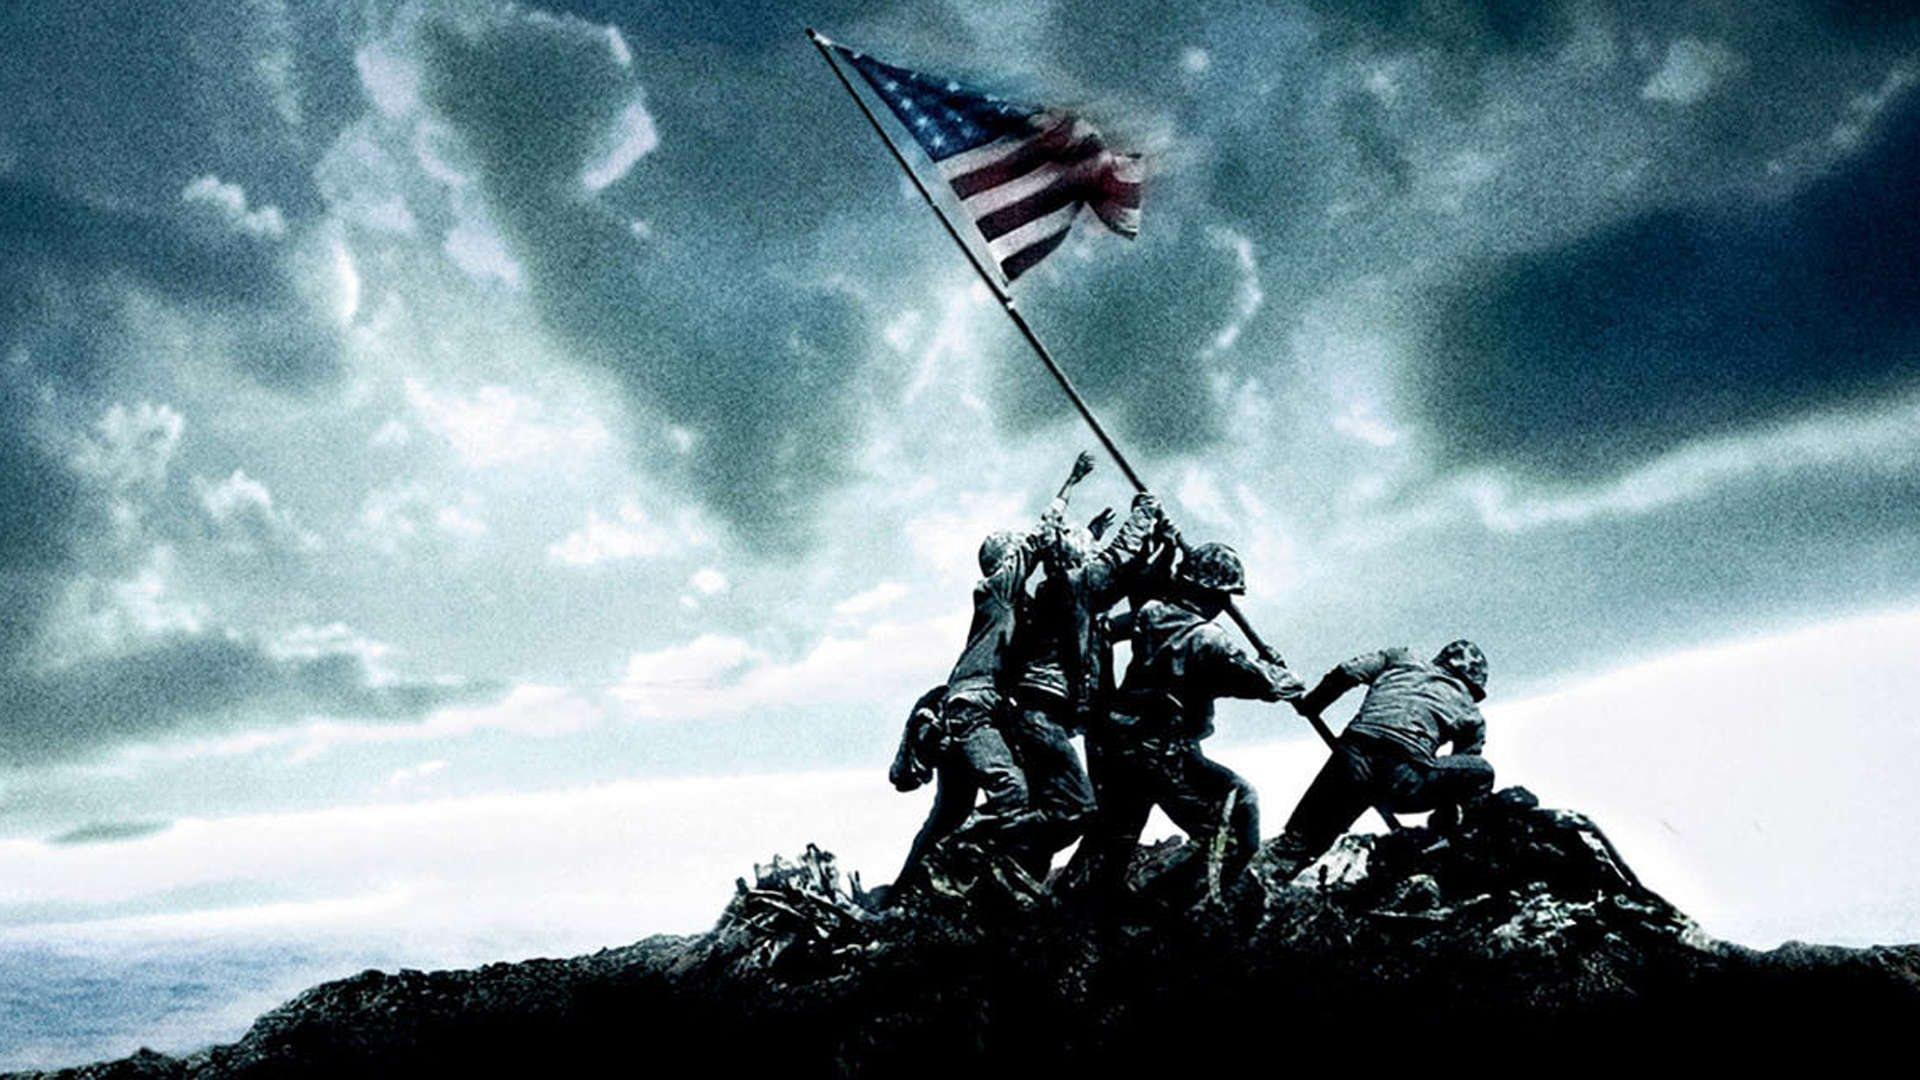 Iwo Jima Flag Raising Wallpaper 1920x1080